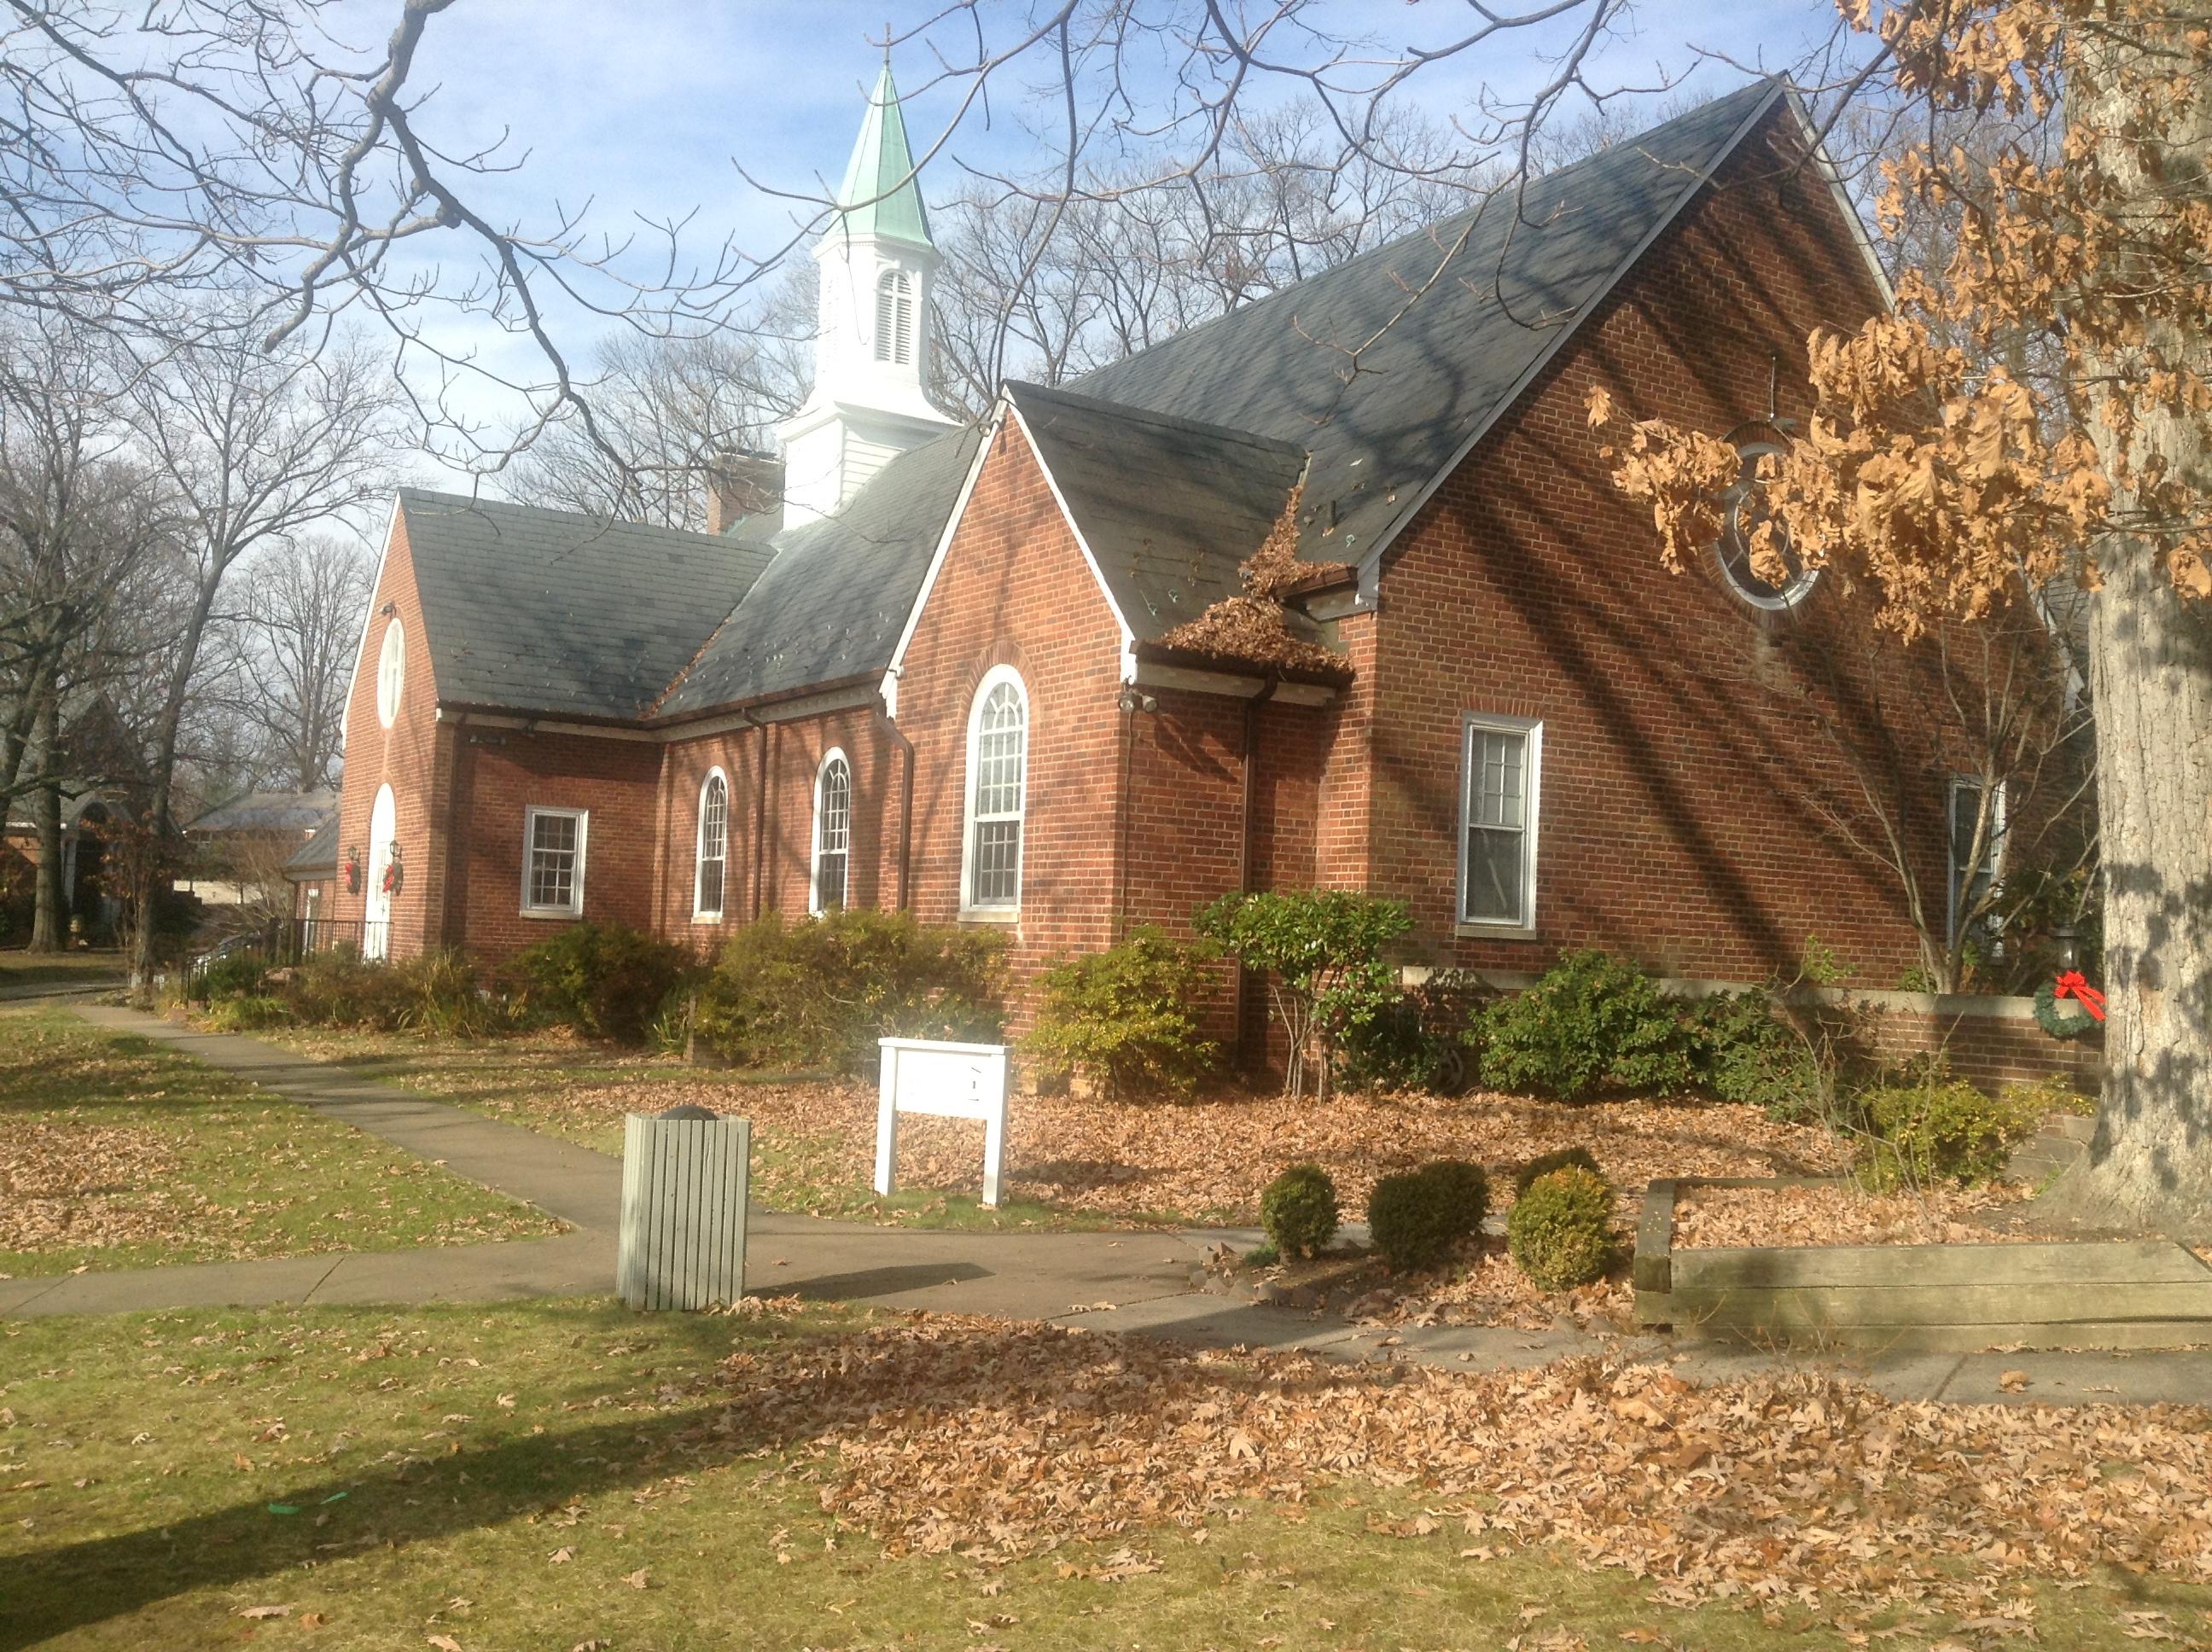 TPC Sermon 2014-11-30: Being Isaiah